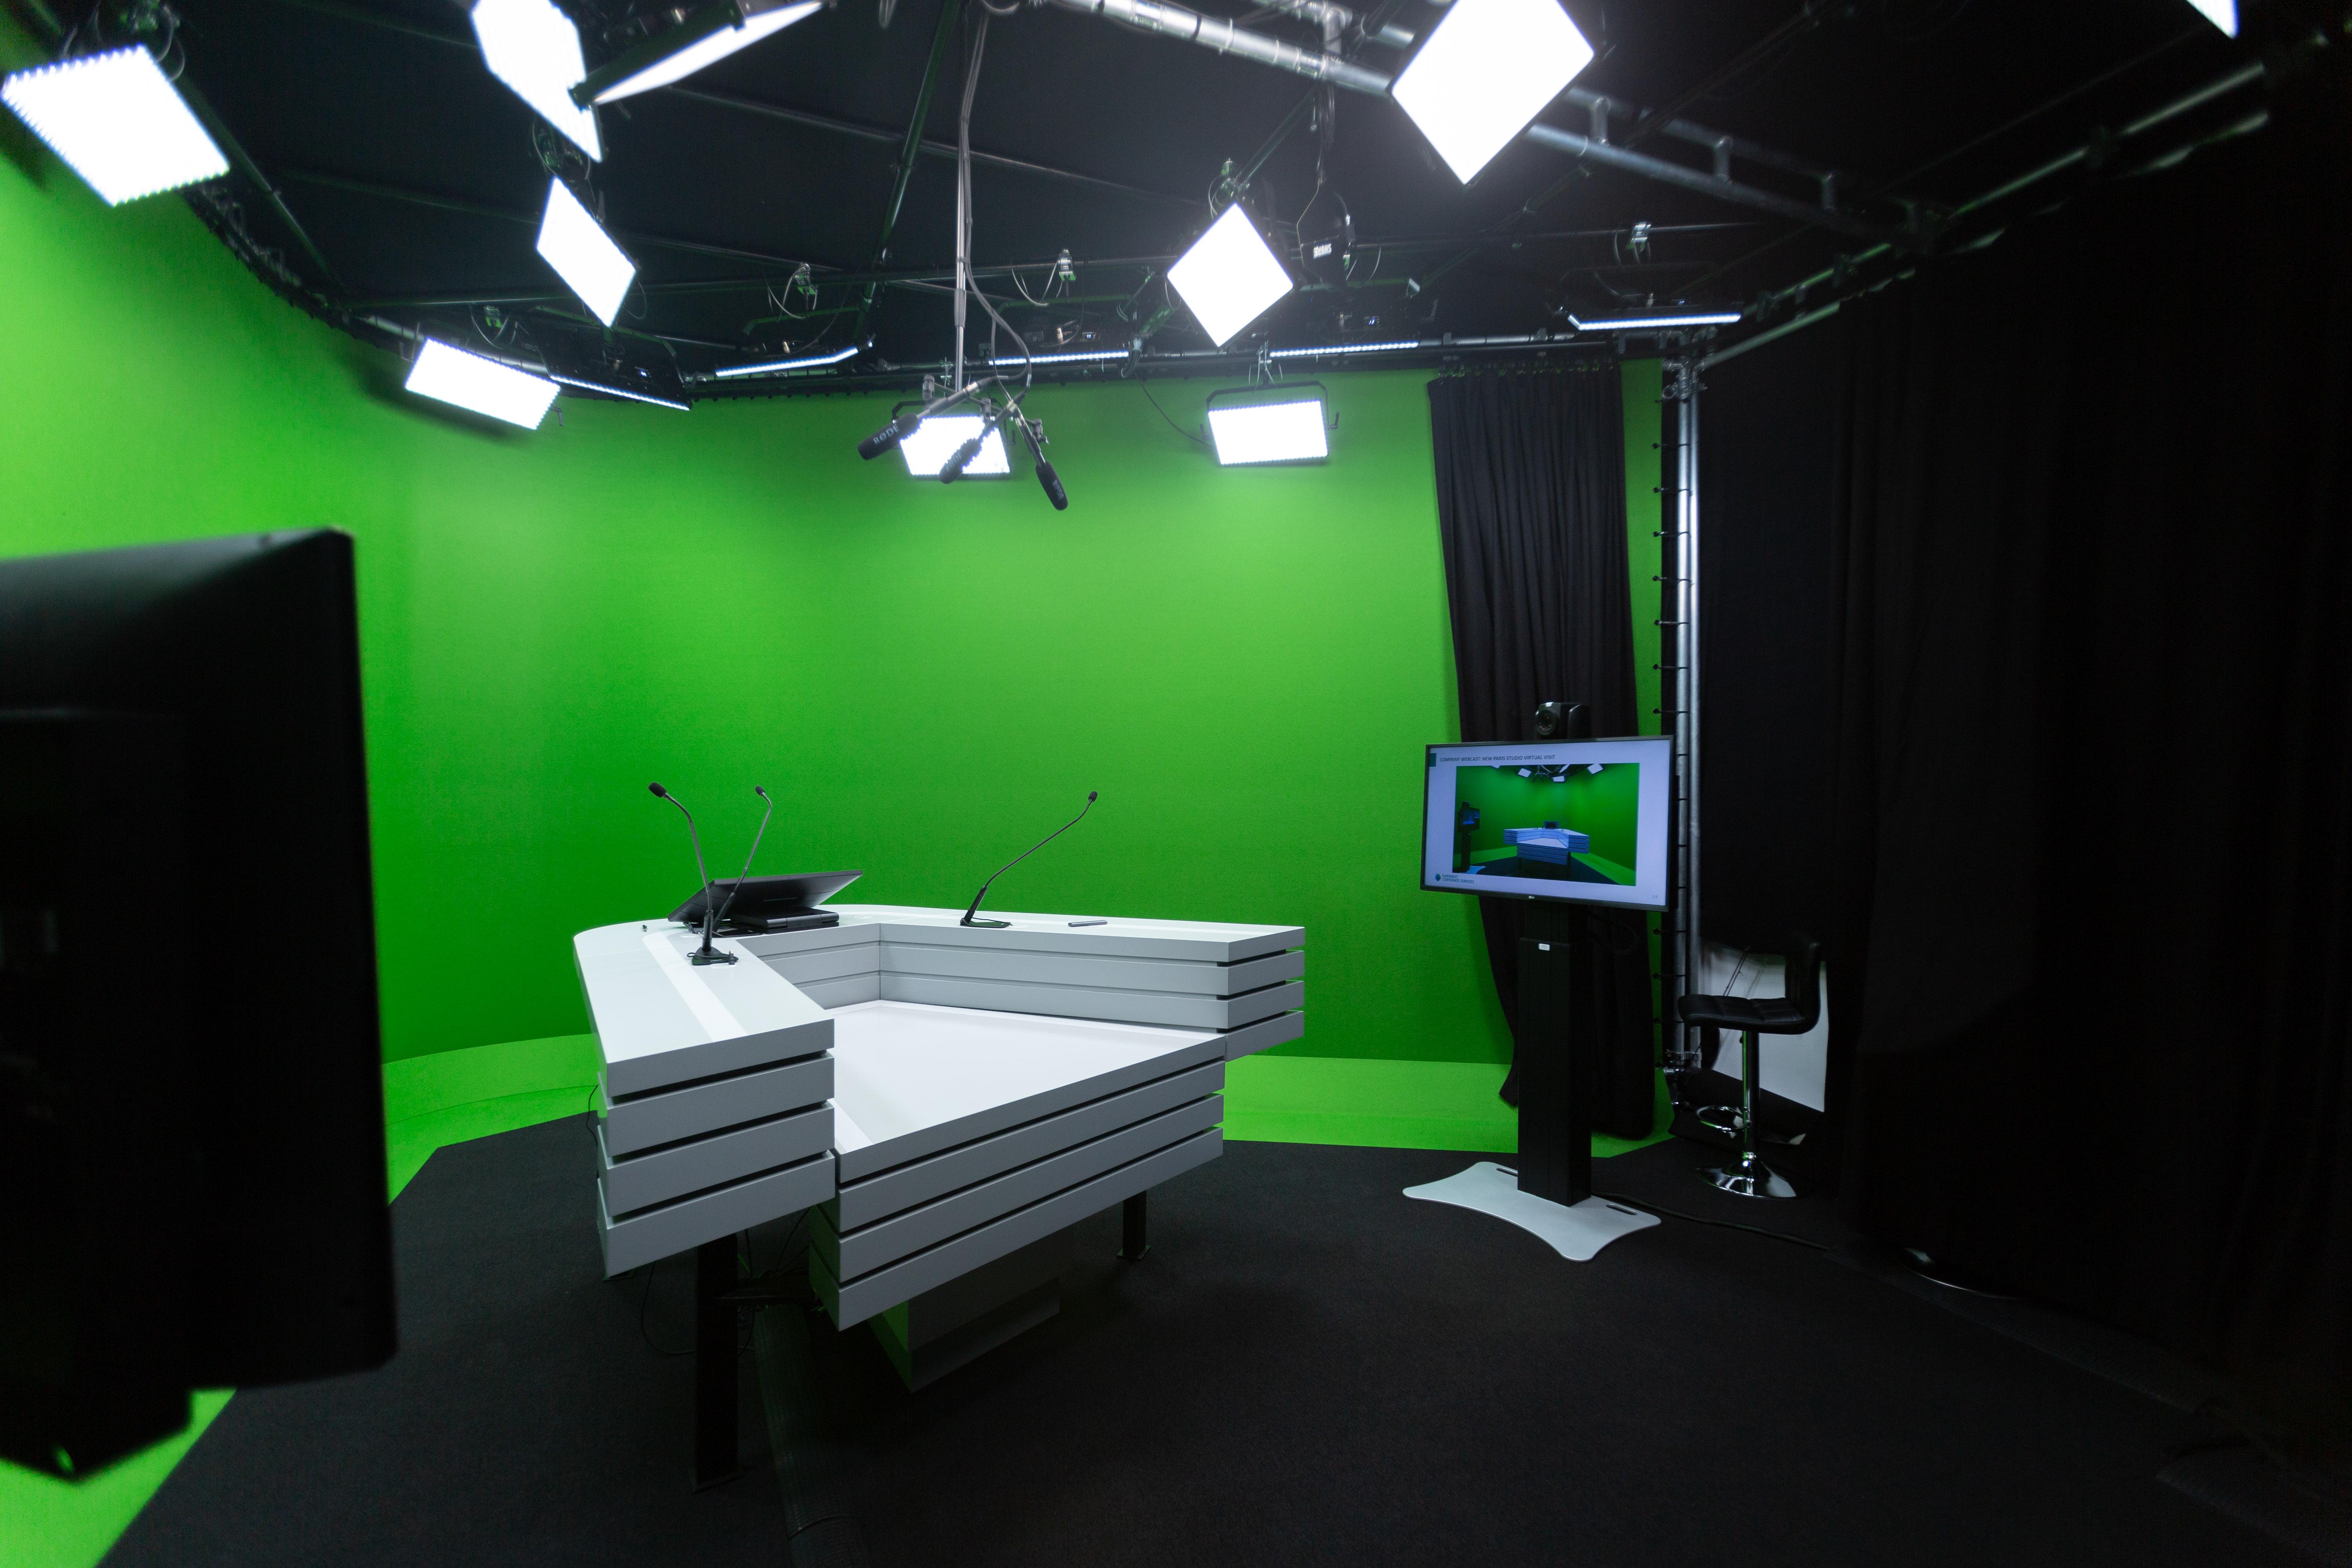 Company Webcast - 20200908_Utopix_Euronext_Reportage Studio_Aurelie-2